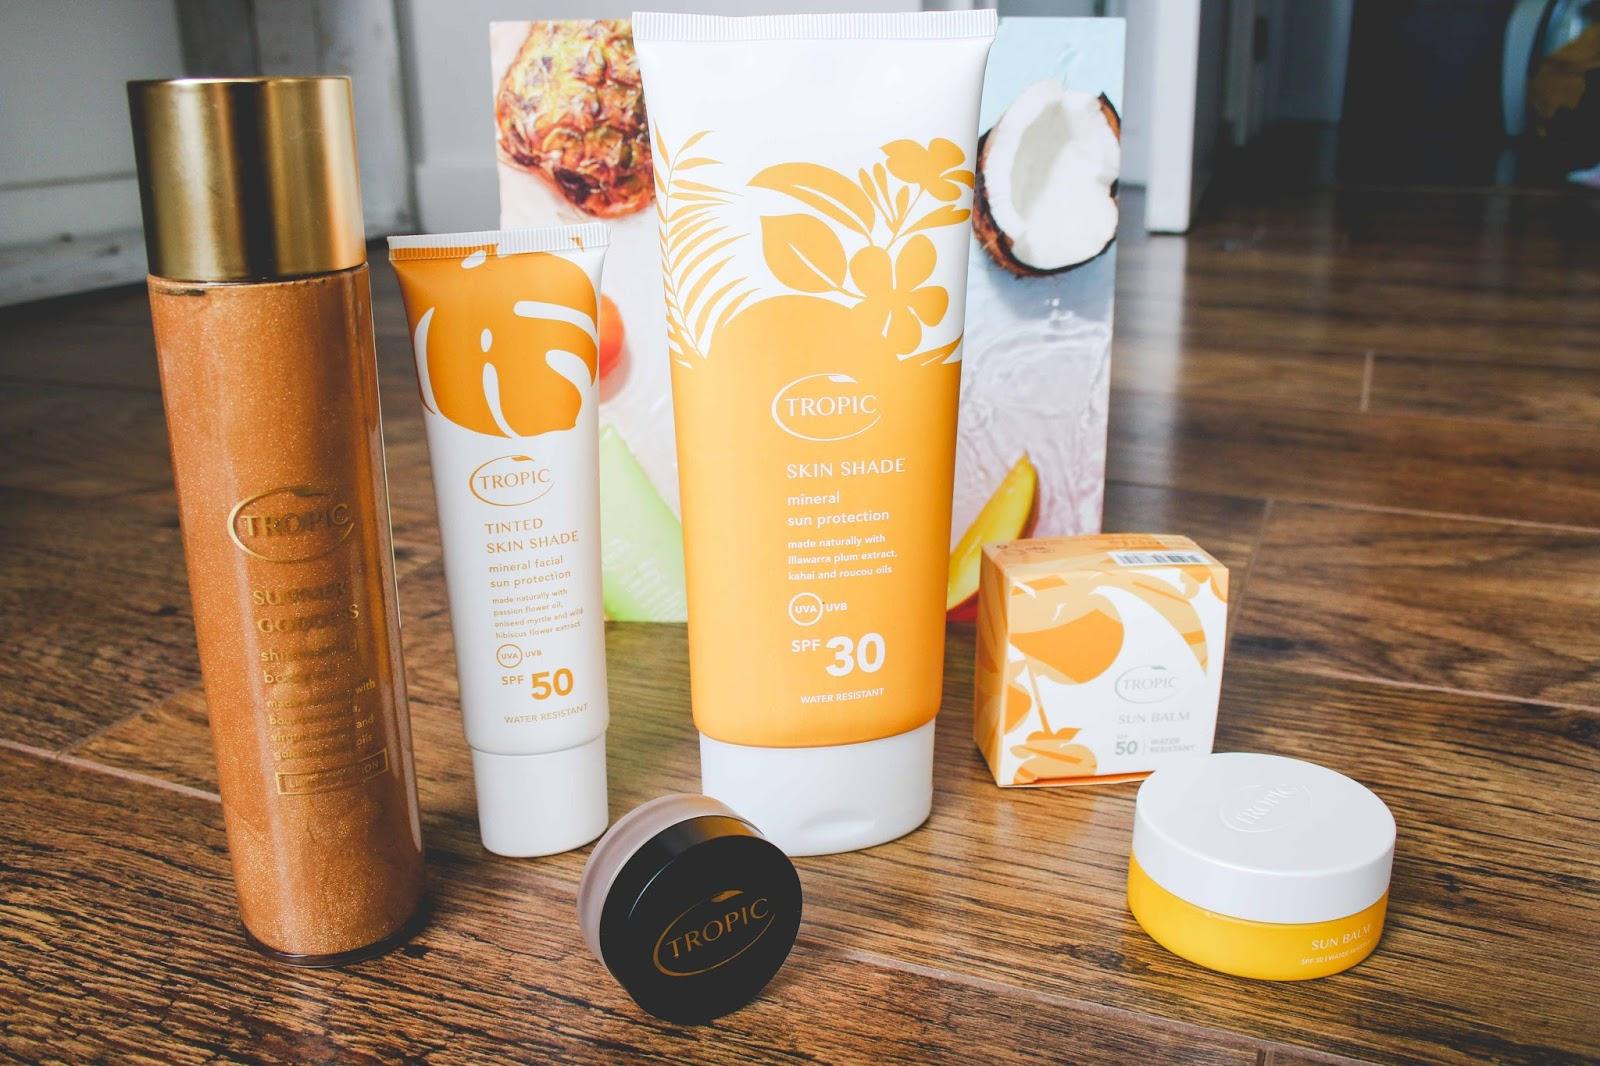 Tropic skincare sunscreen range